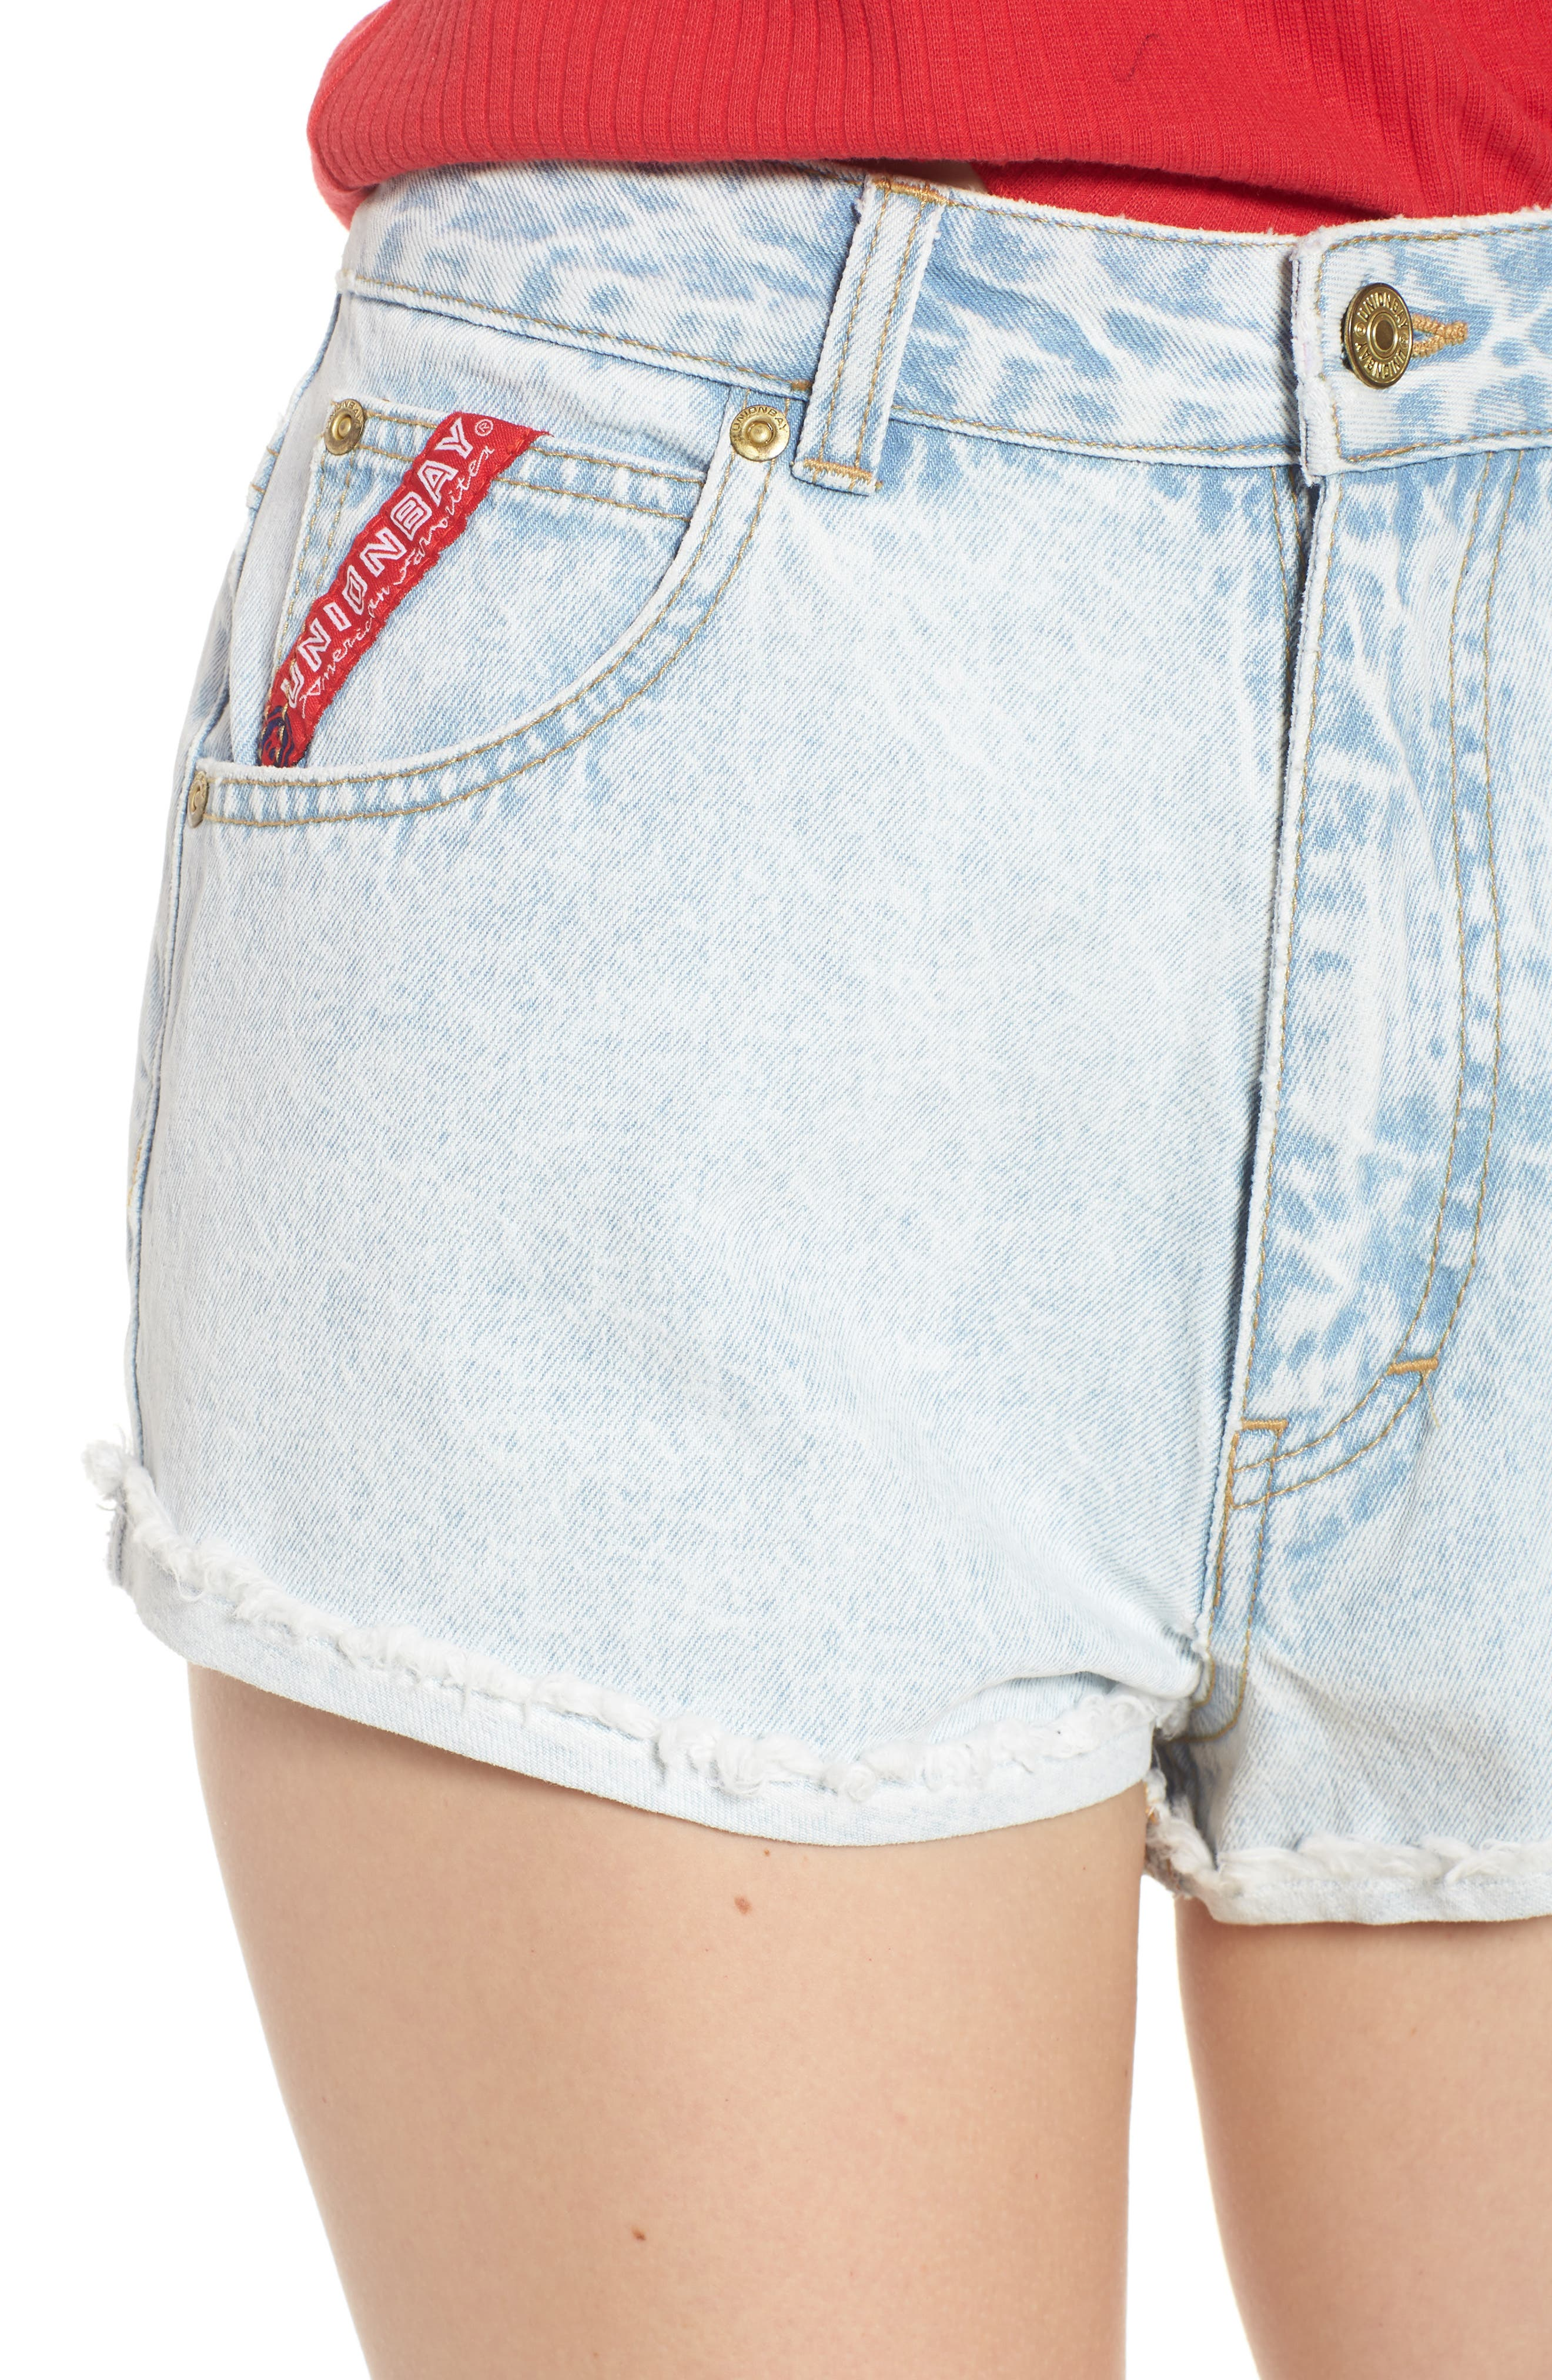 Unionbay Devo Acid Wash Denim Shorts,                             Alternate thumbnail 4, color,                             Icy Wash